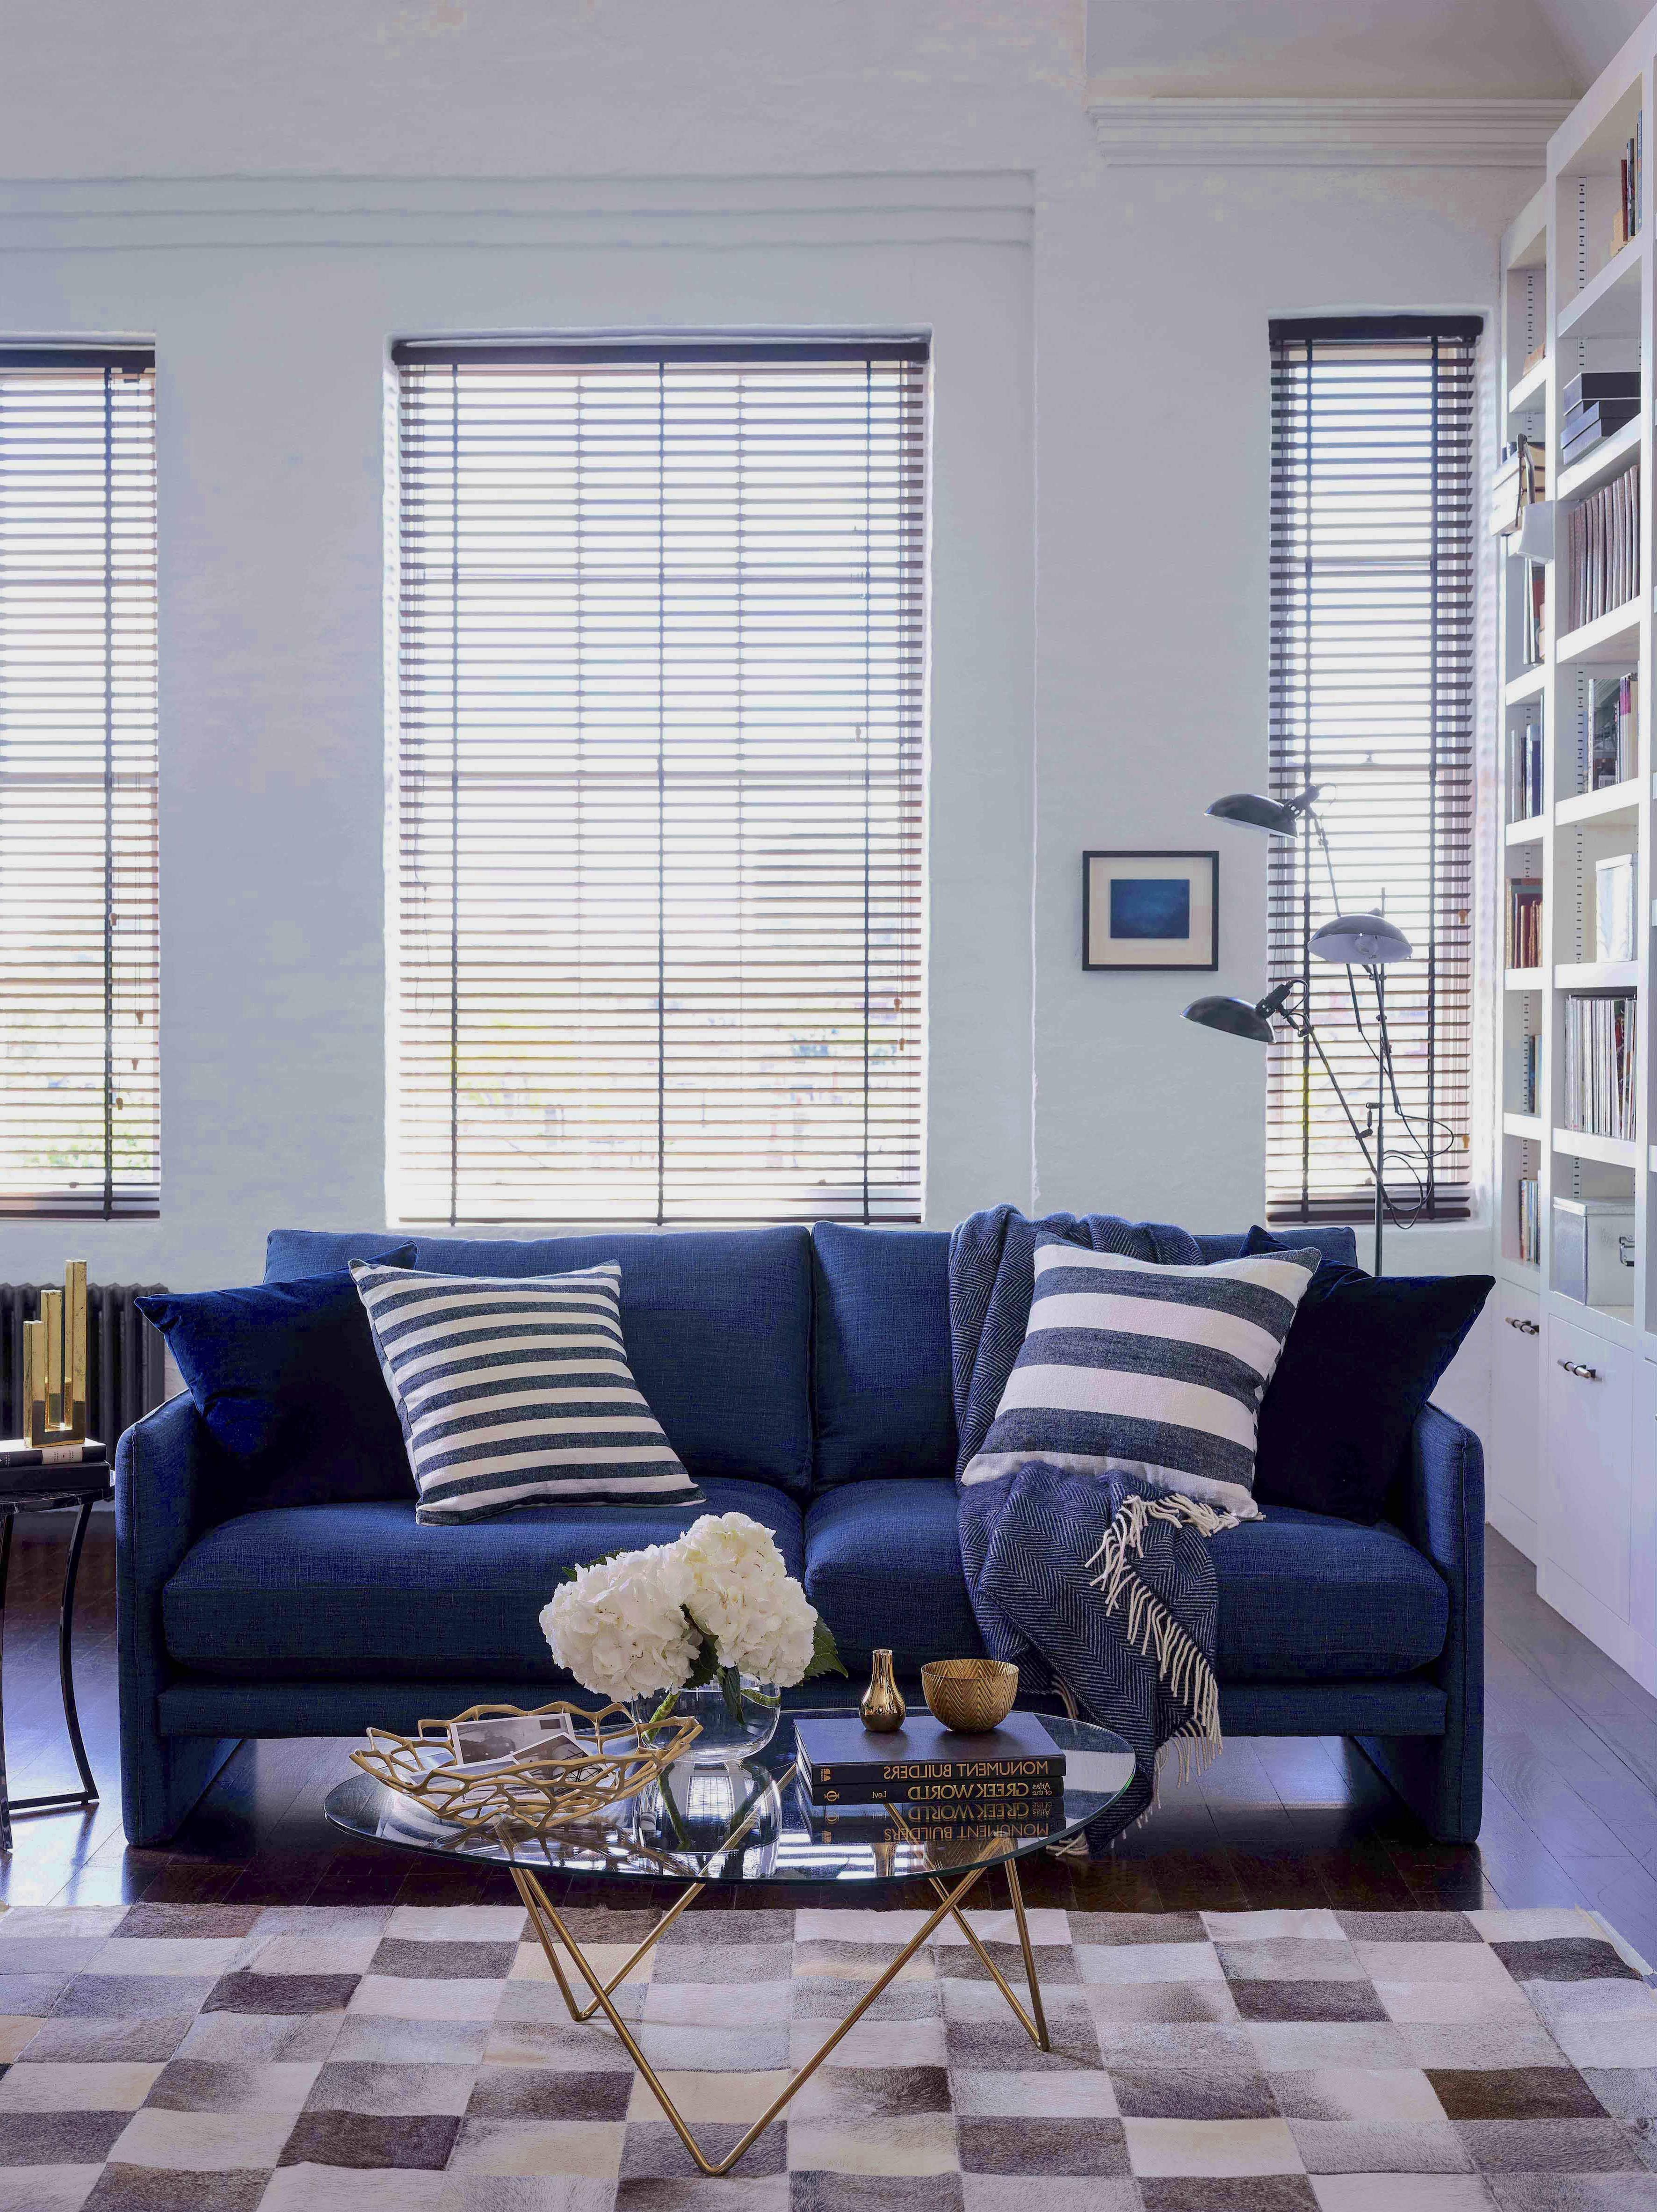 Sofa Com Budm Furniture Projects